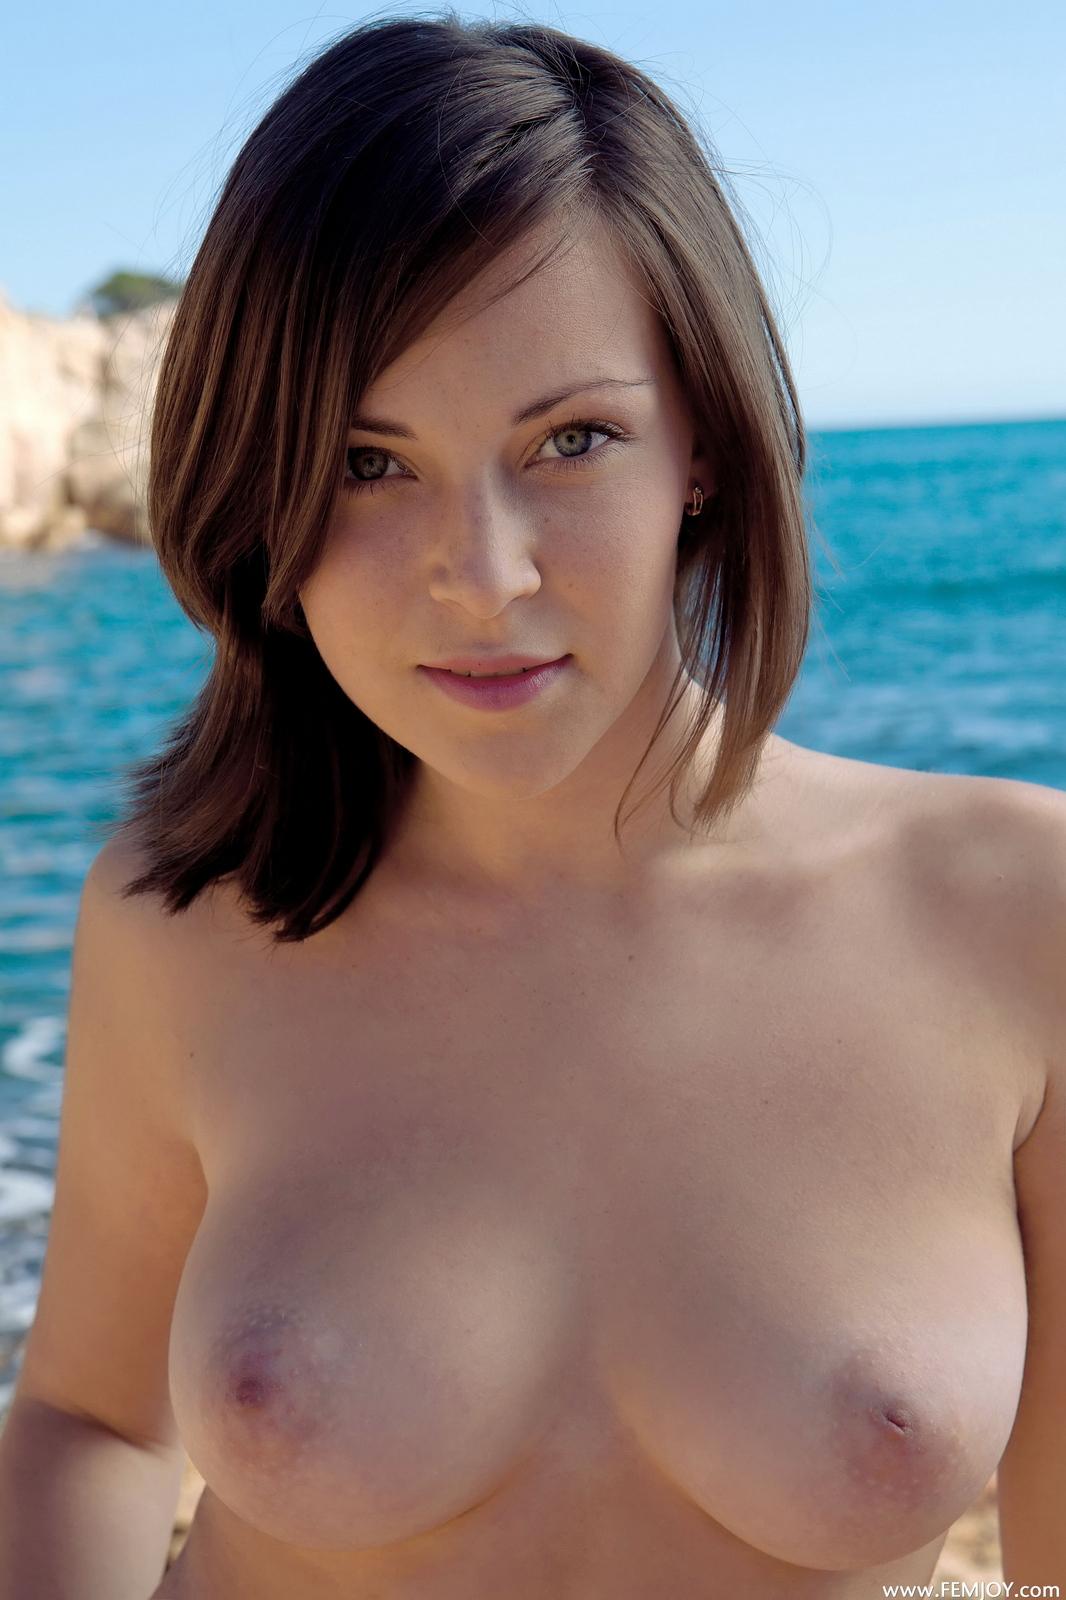 sophia-h-seaside-naked-boobs-rocks-femjoy-26